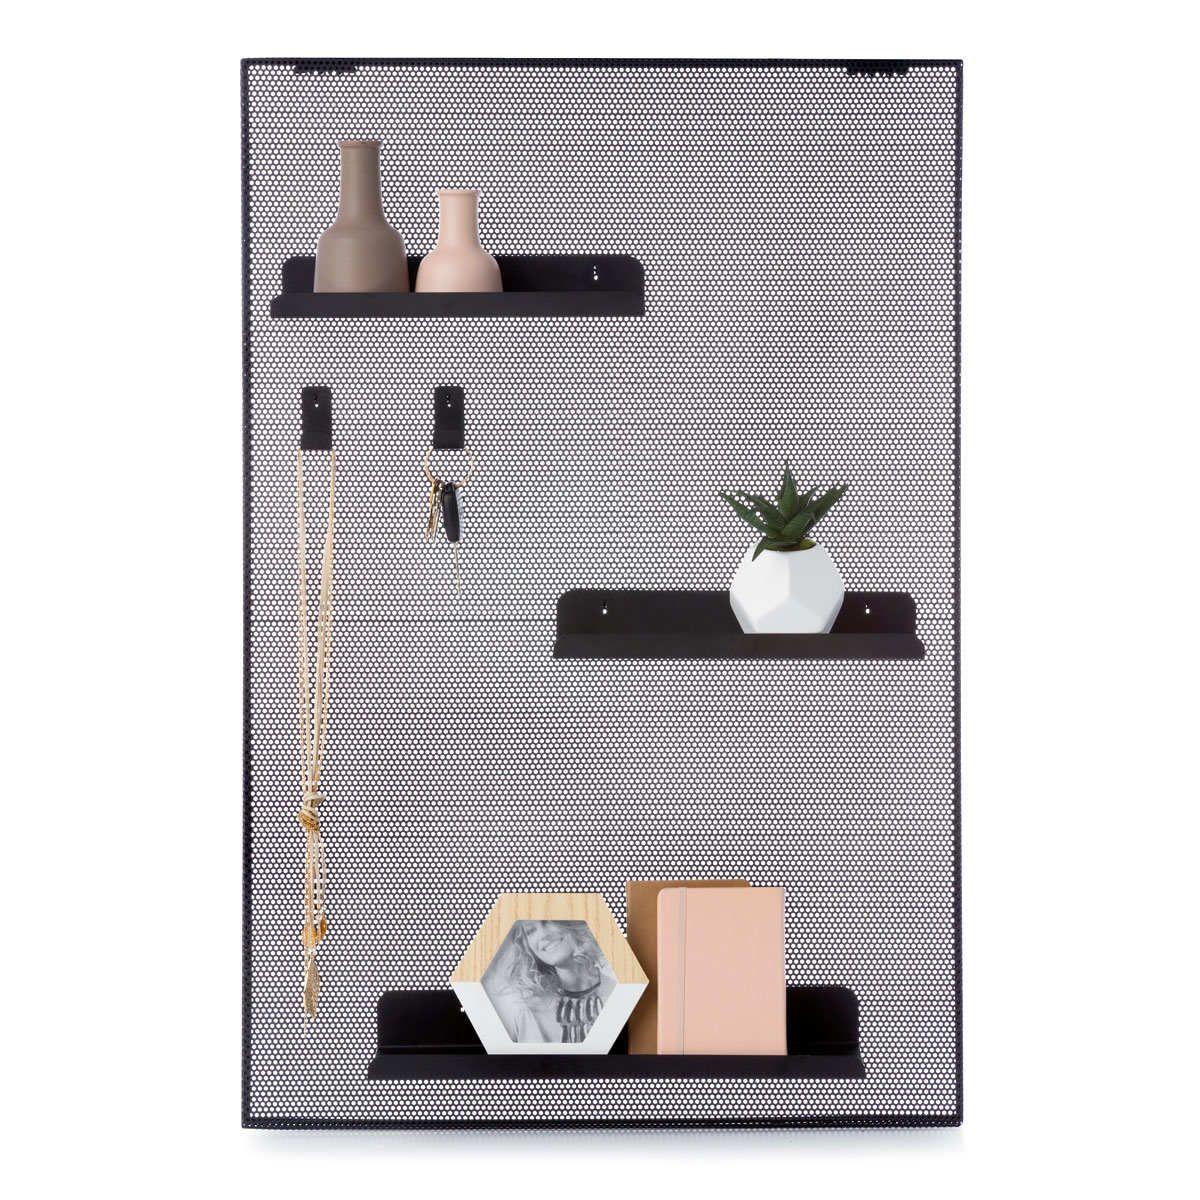 Adjustable Metal Wall Shelf Kmart 29 Require Parental Consent